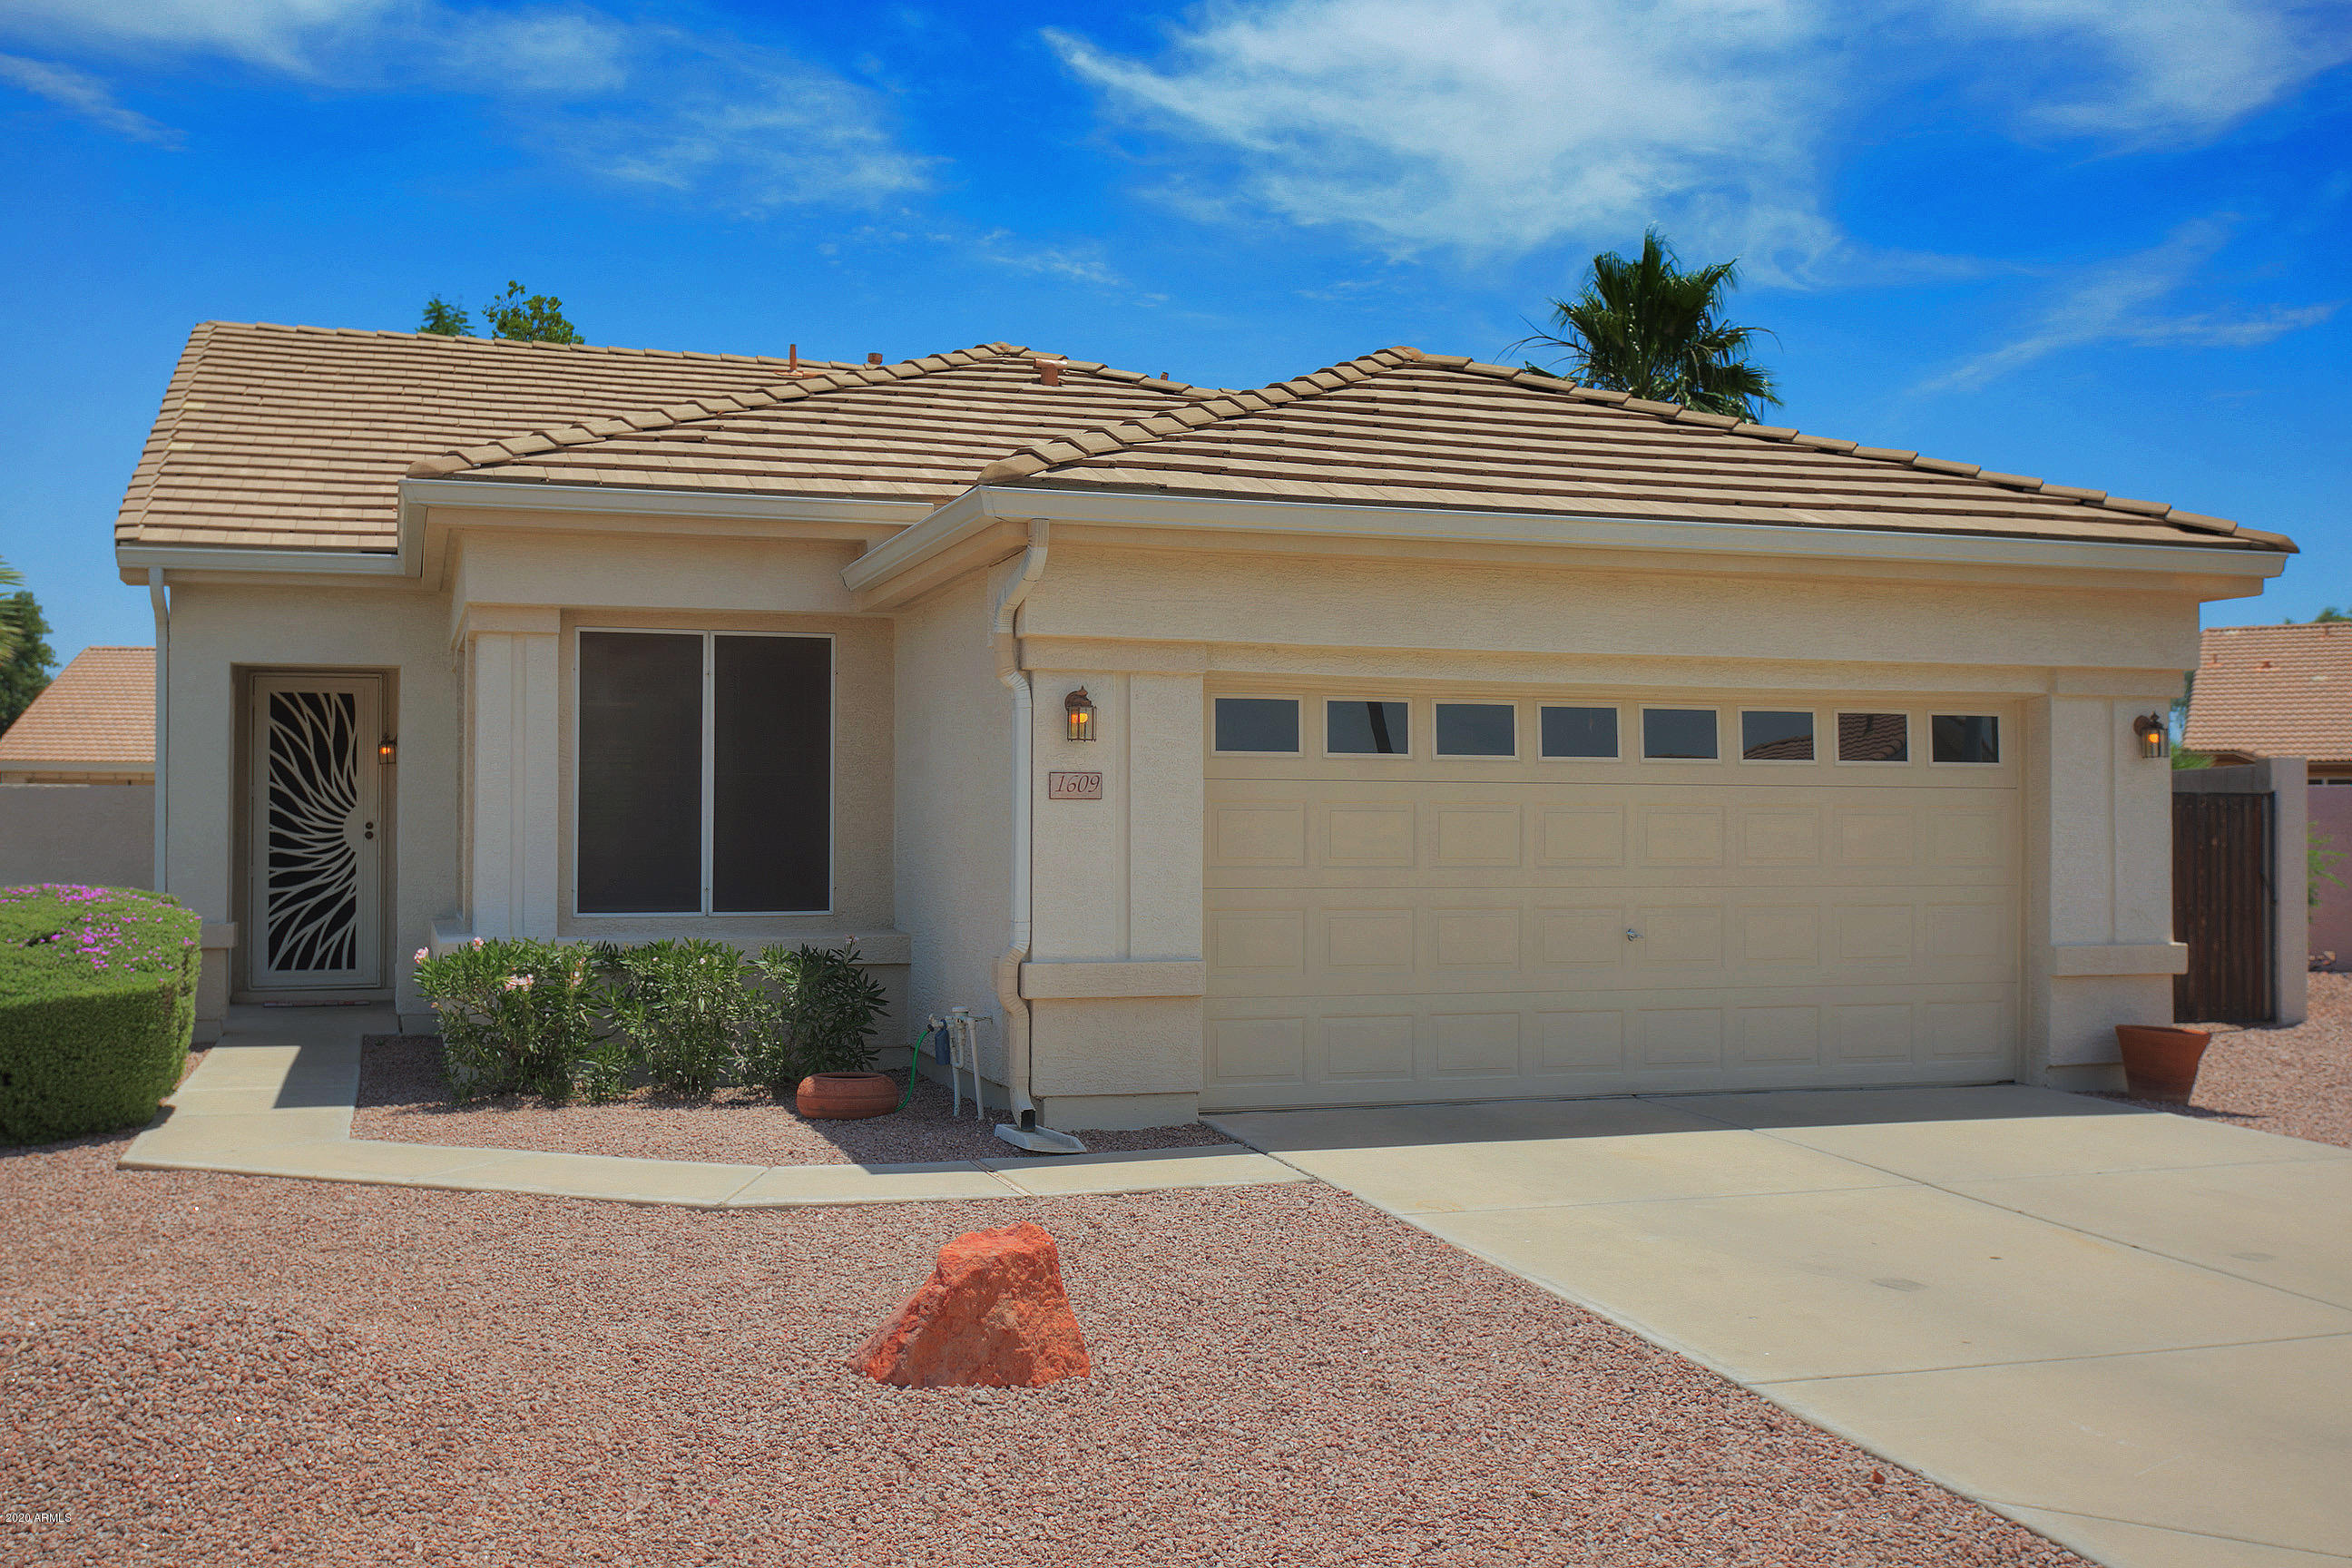 Photo of 1609 E MEGAN Street, Chandler, AZ 85225